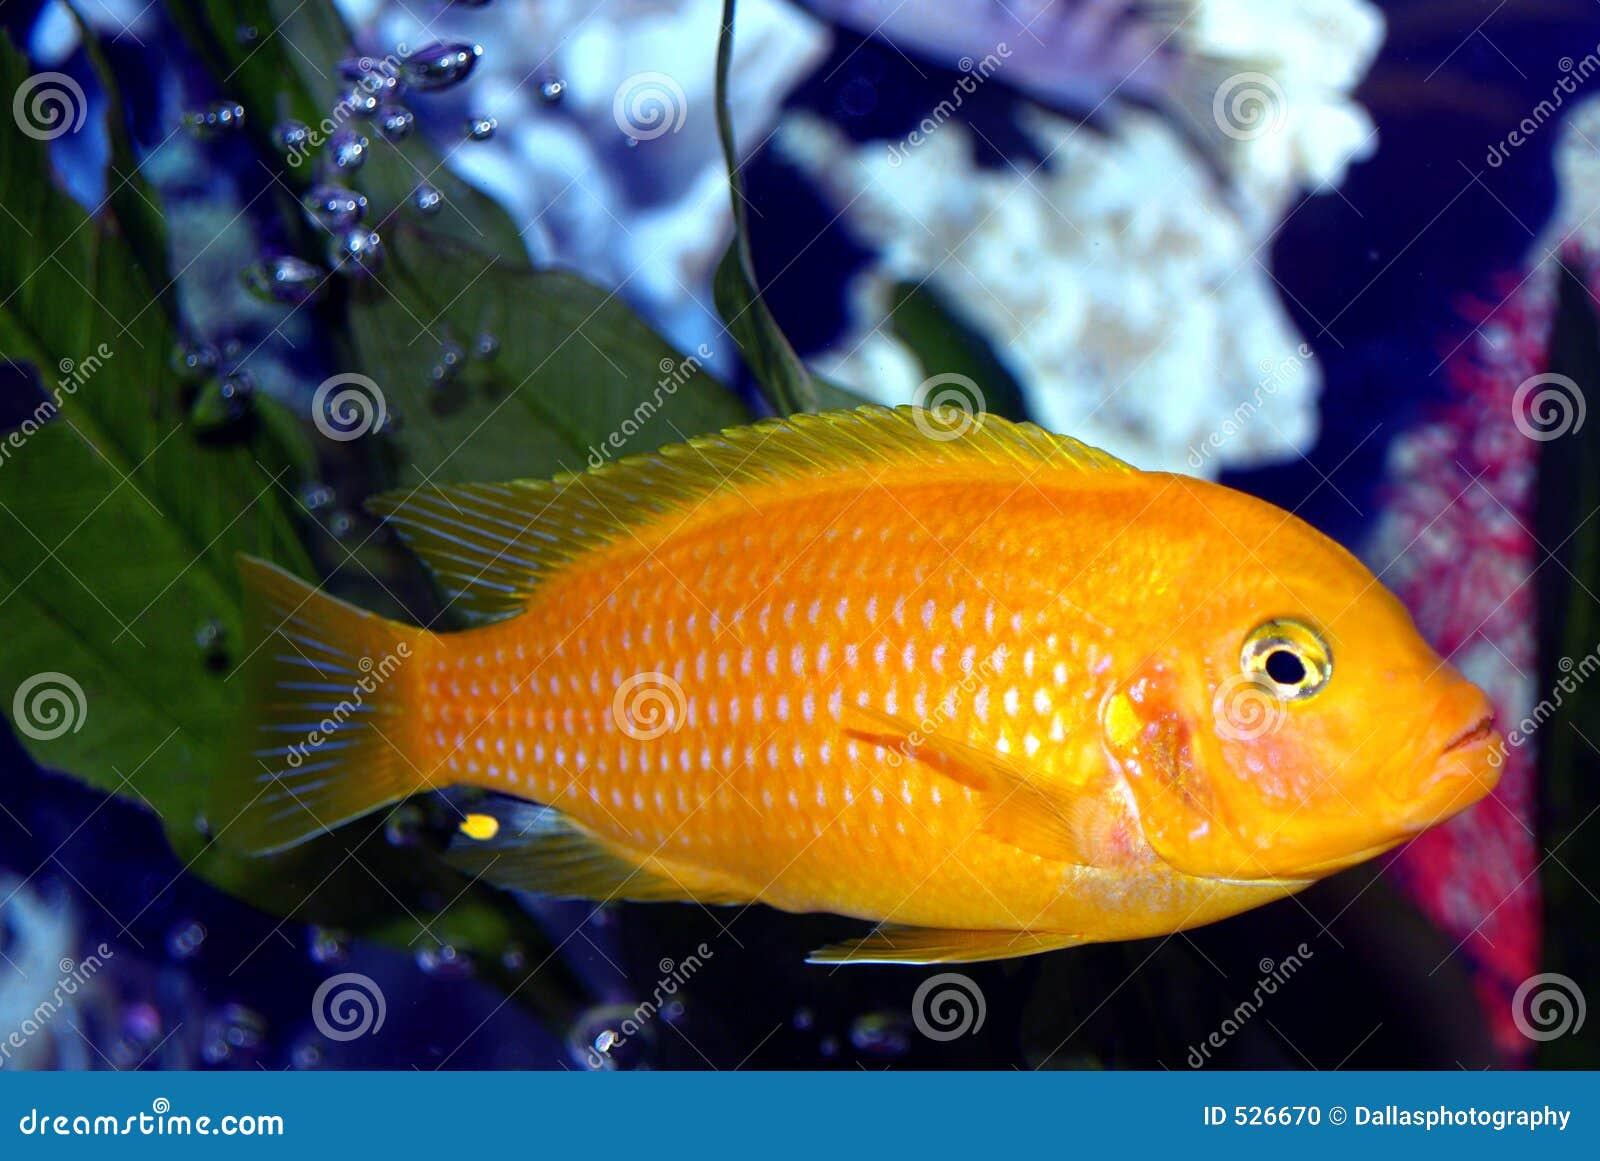 Download 鱼热带kenyi的男 库存照片. 图片 包括有 新鲜, 宠物, 坦克, 淡水, 重婚, 海洋, 种类, 破擦声 - 526670